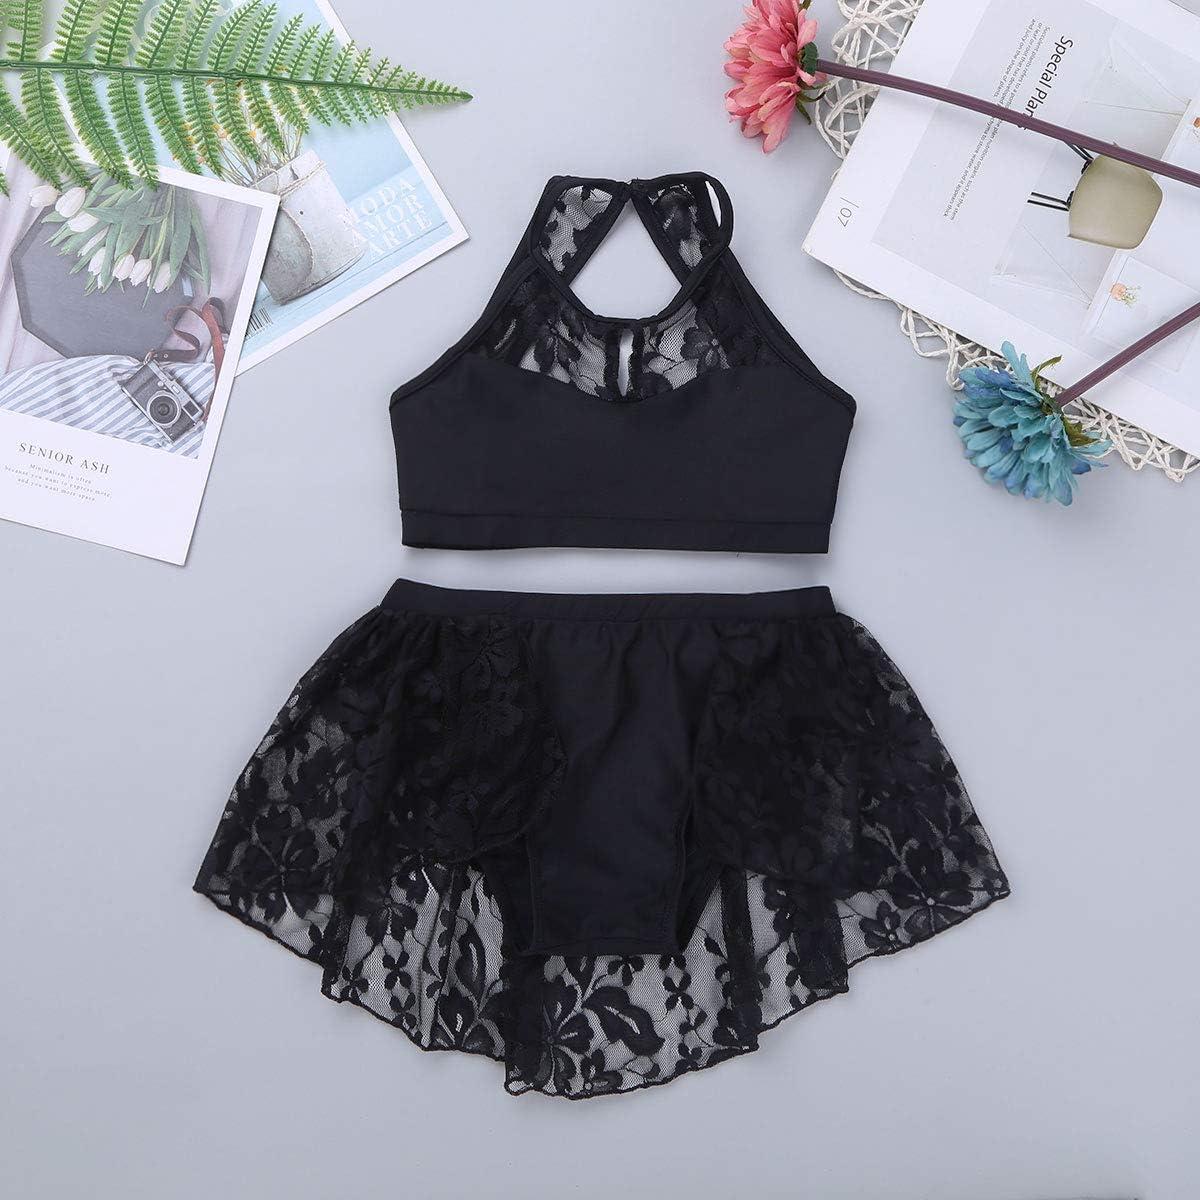 Yeahdor Children Kids Lace Floral 2 Pieces Lyrical Modern Contemporary Dance Outfits Active Crop Top /& Tutu Skirt